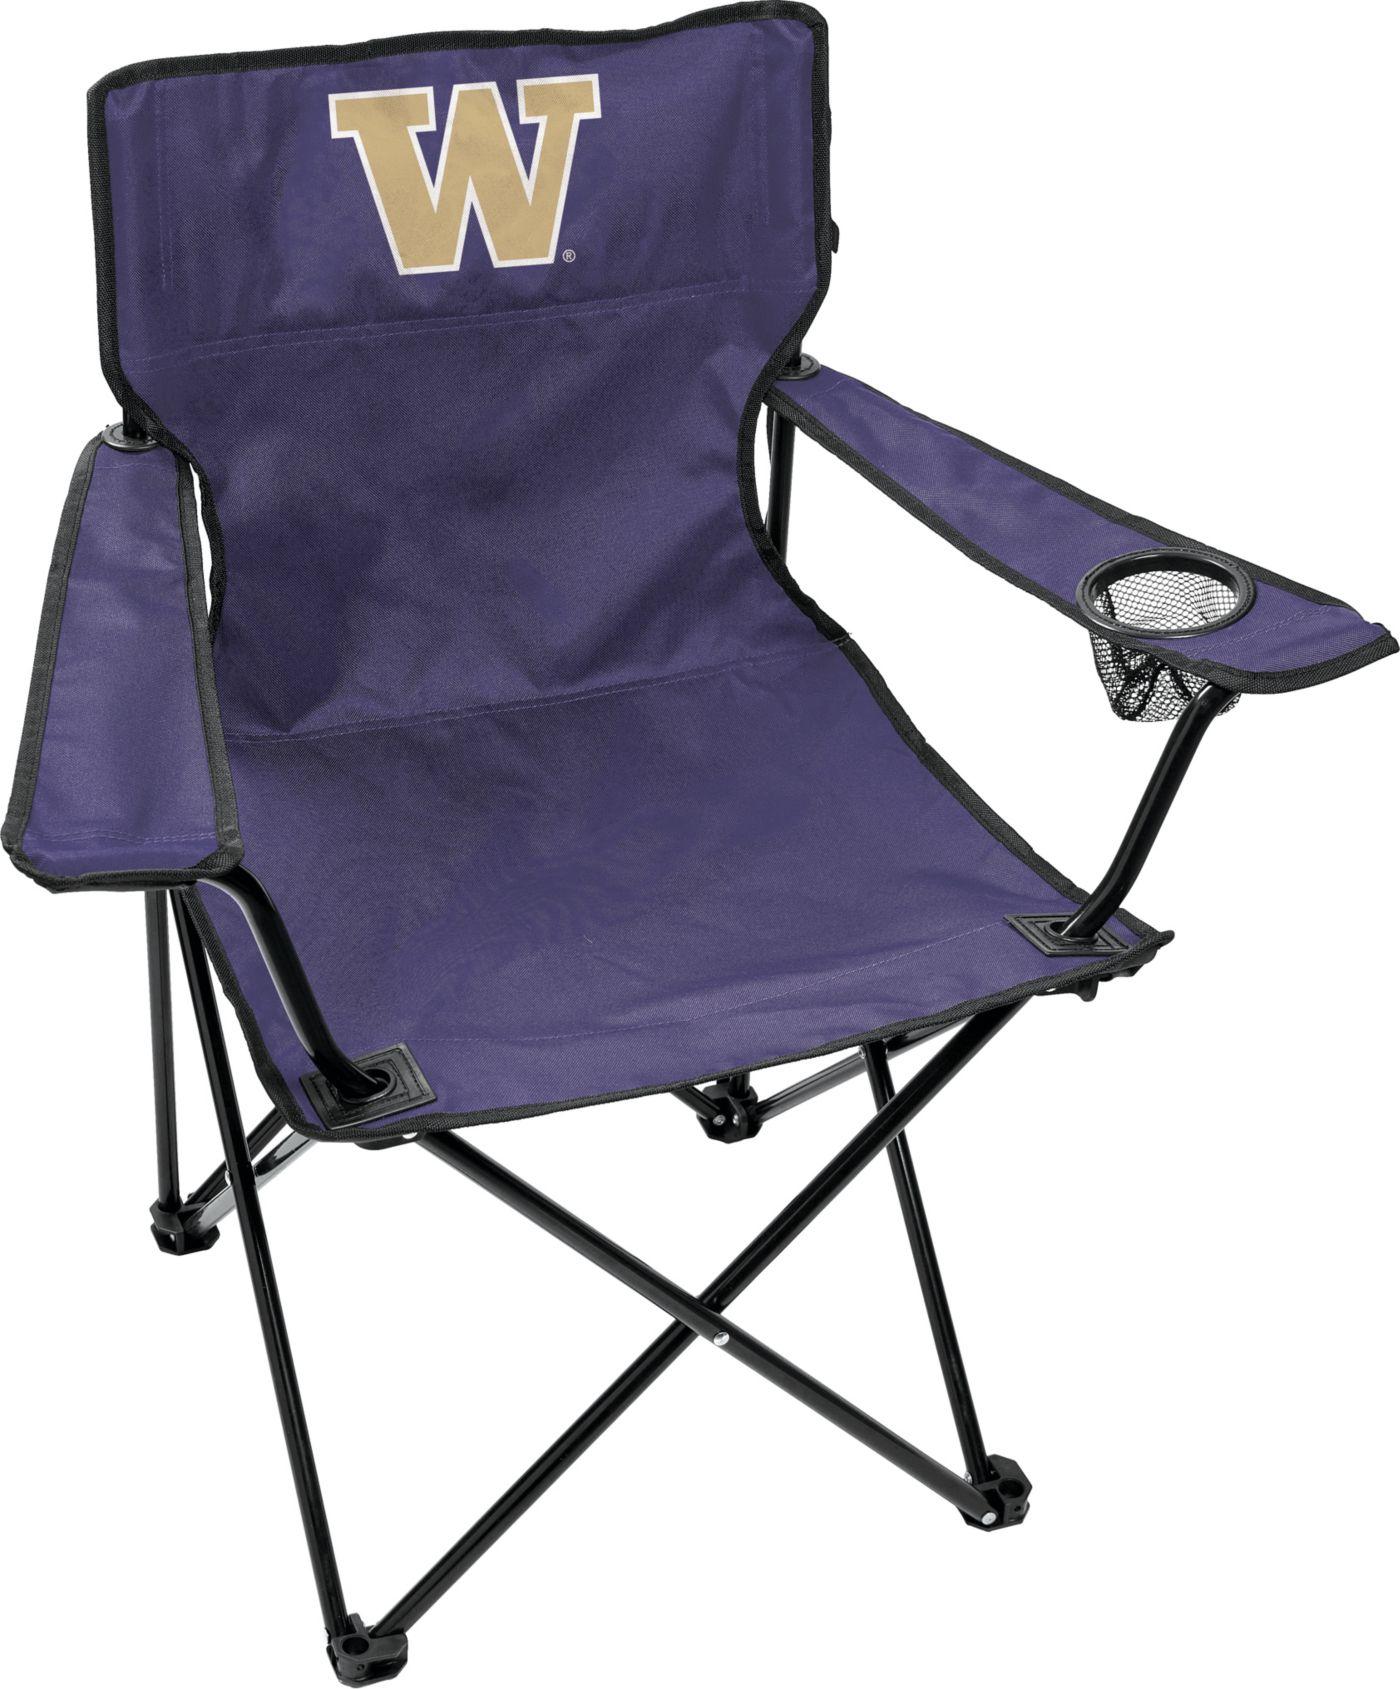 Rawlings Washington Huskies Game Day Chair